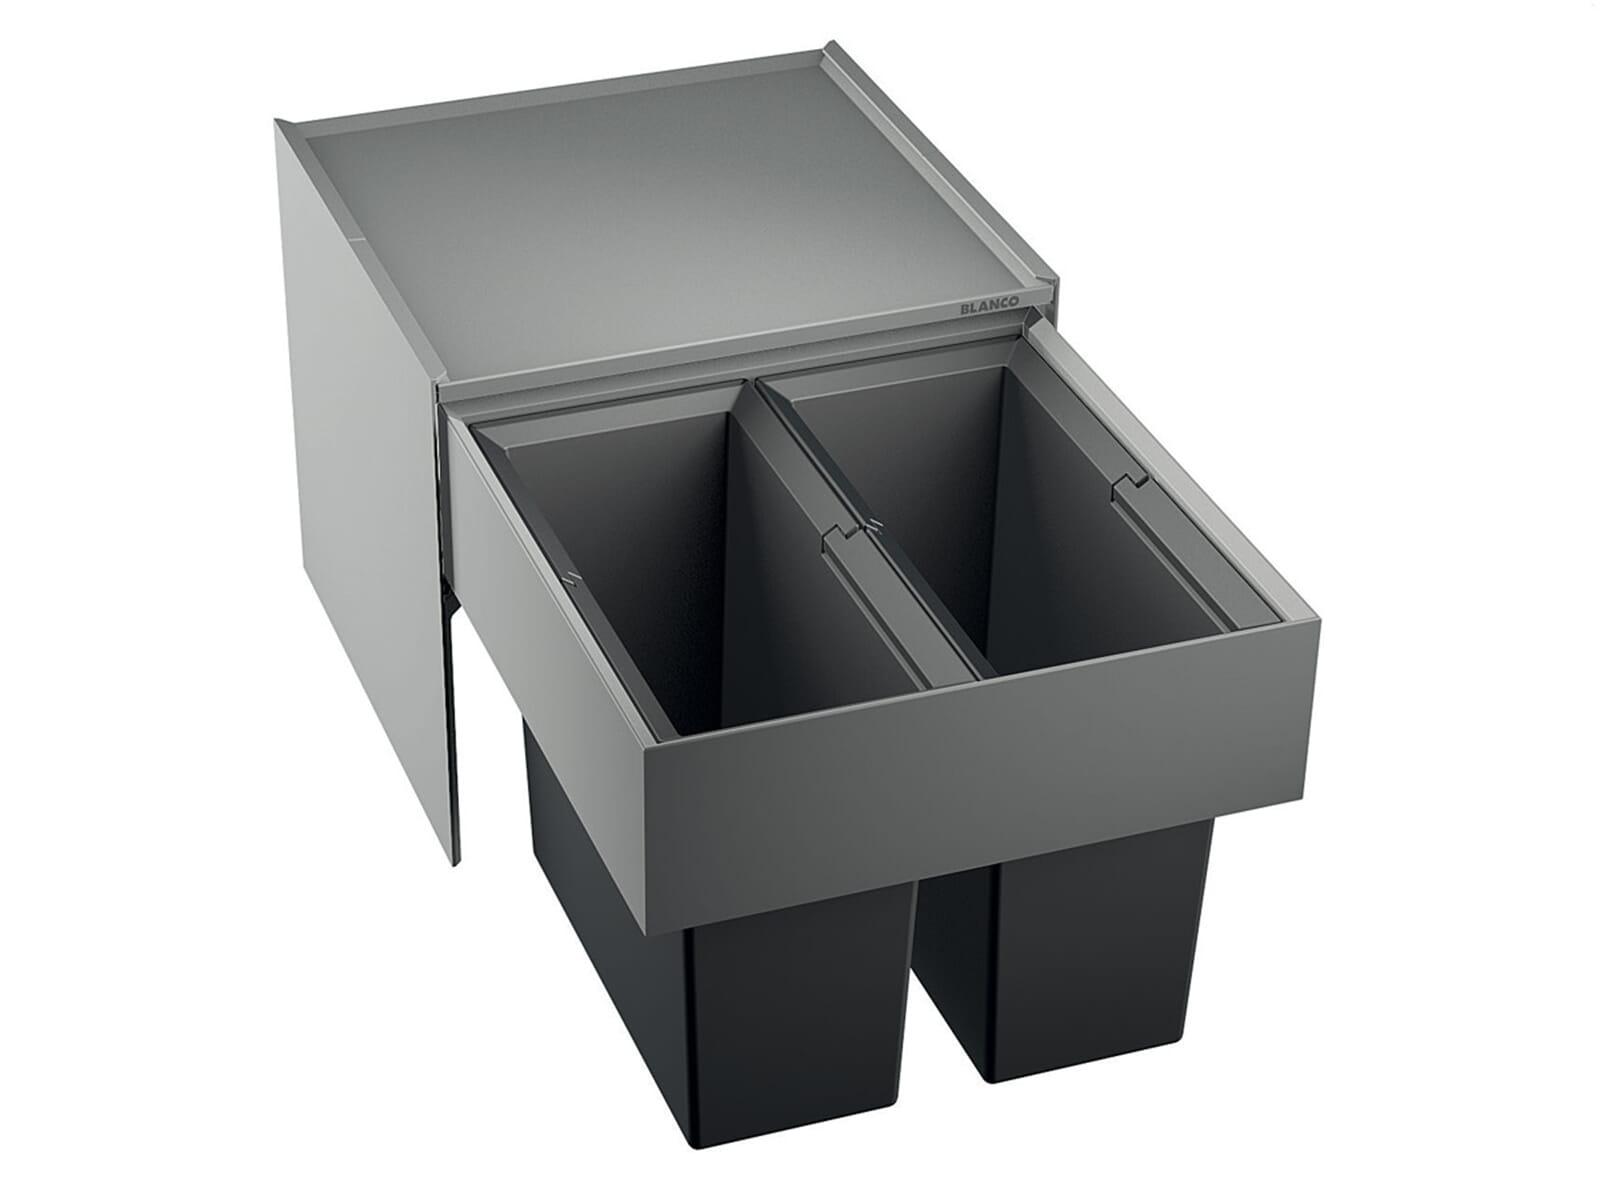 Blanco Select 45/2 Einbau Abfallsammler